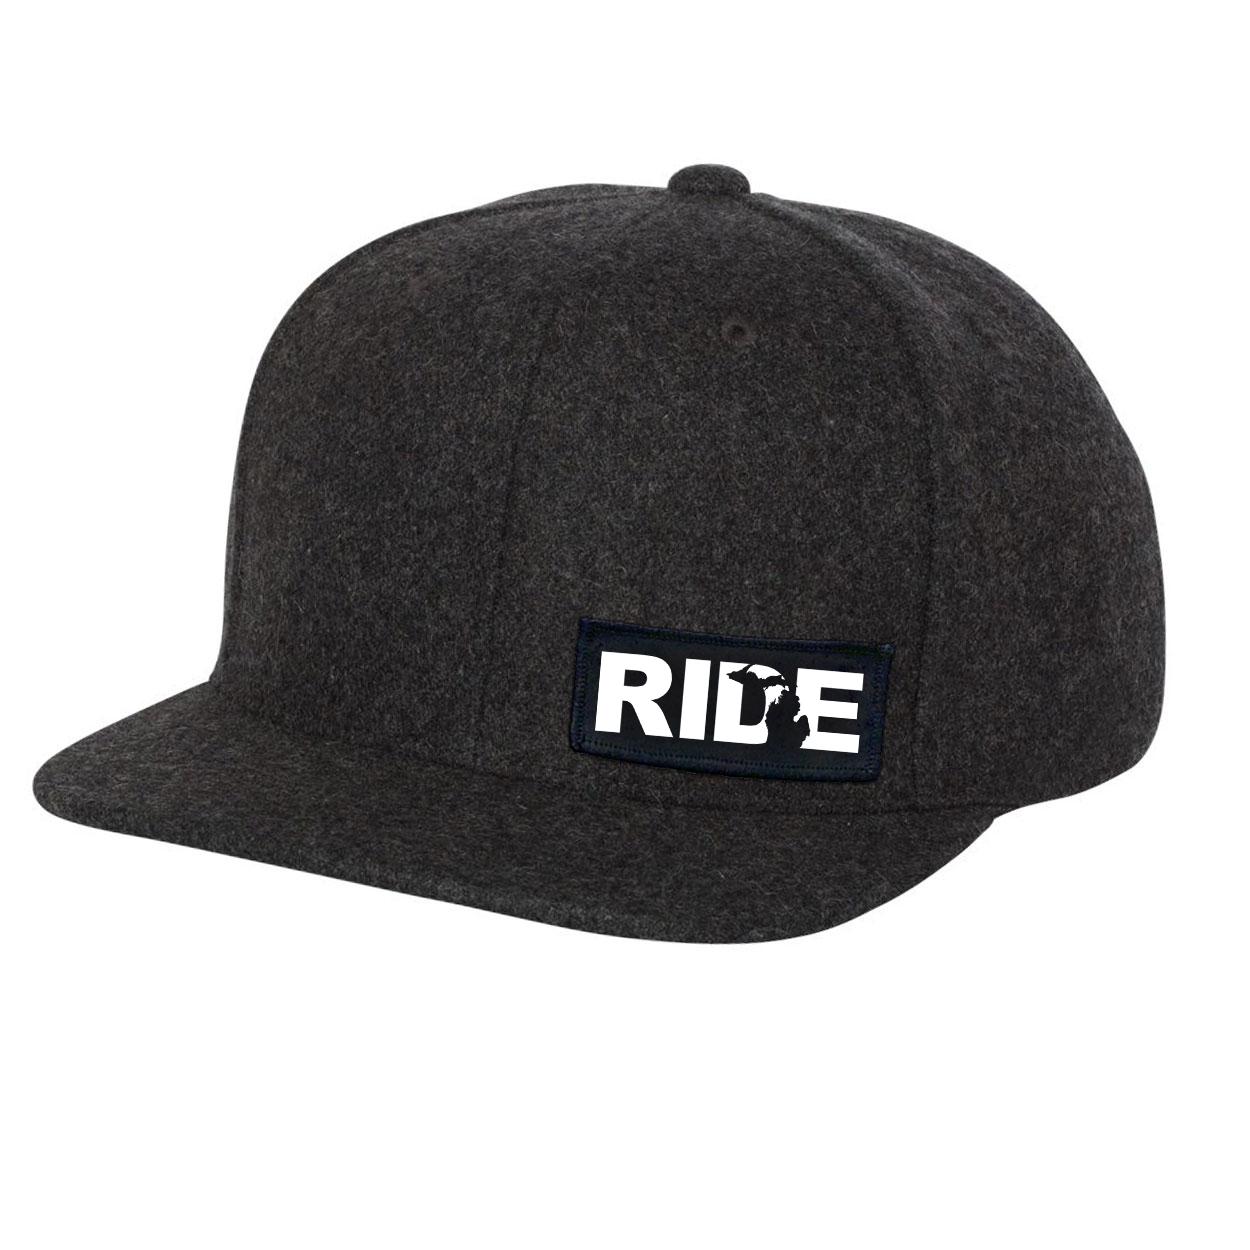 Ride Michigan Night Out Woven Patch Flat Brim Snapback Hat Dark Heather Gray Wool (White Logo)